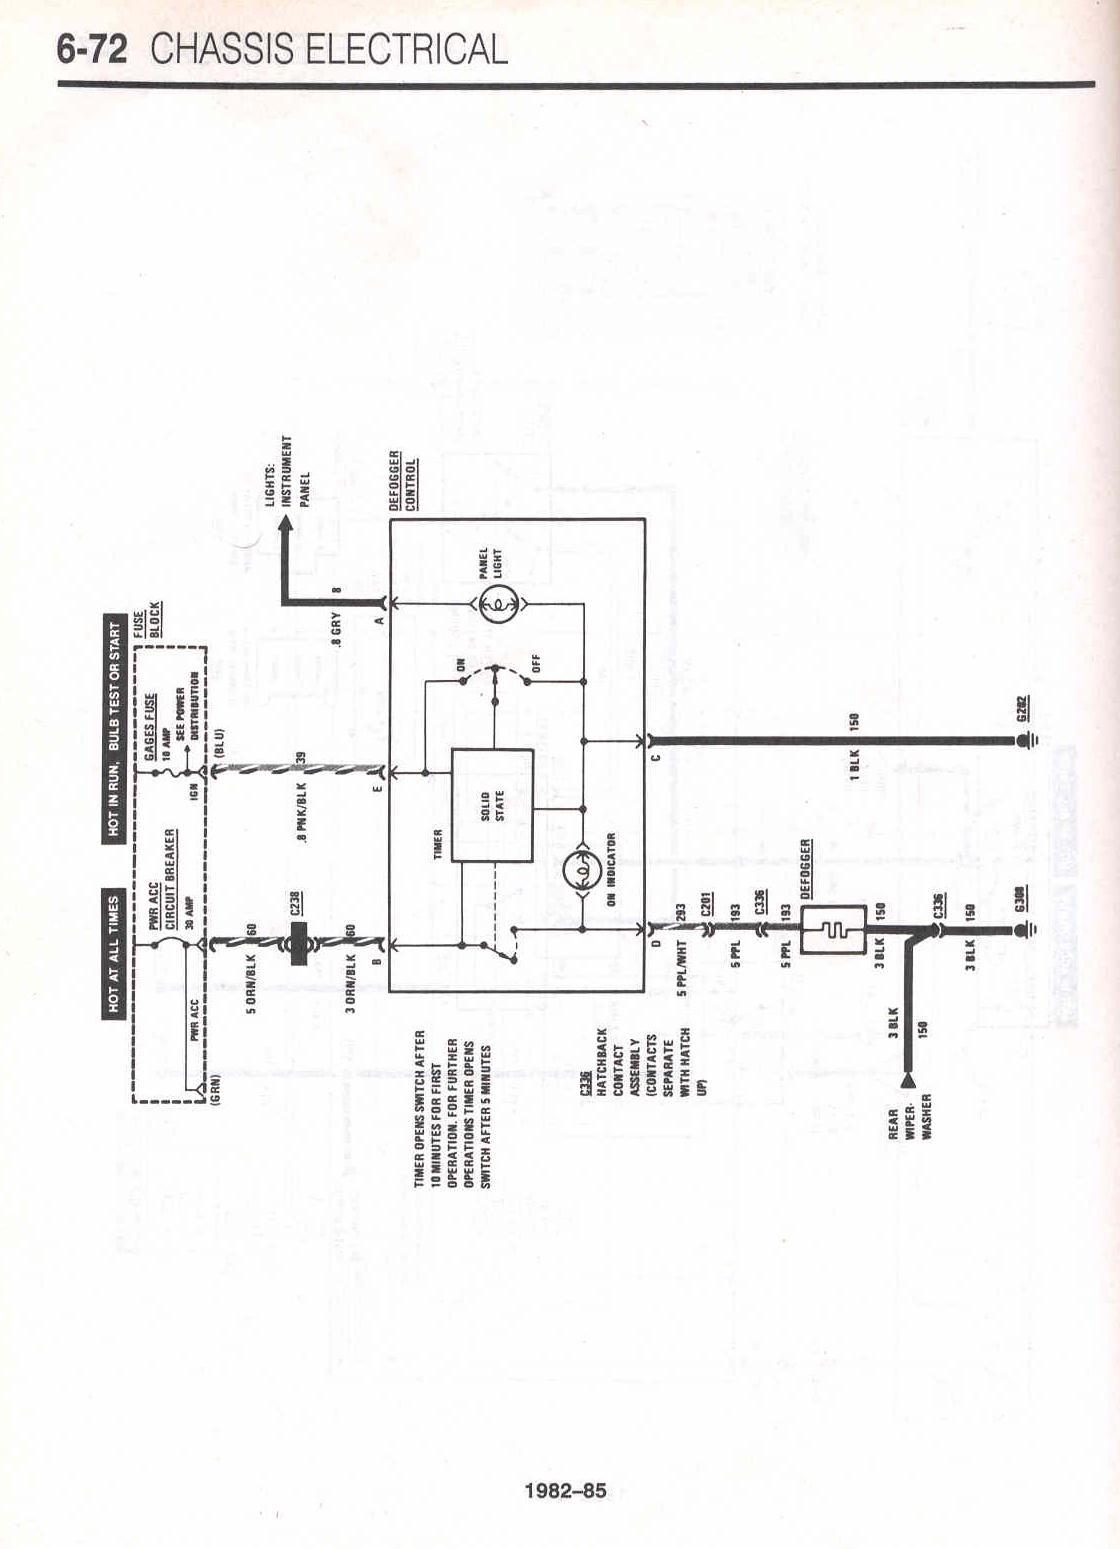 gm ignition switch wiring diagram highbeam